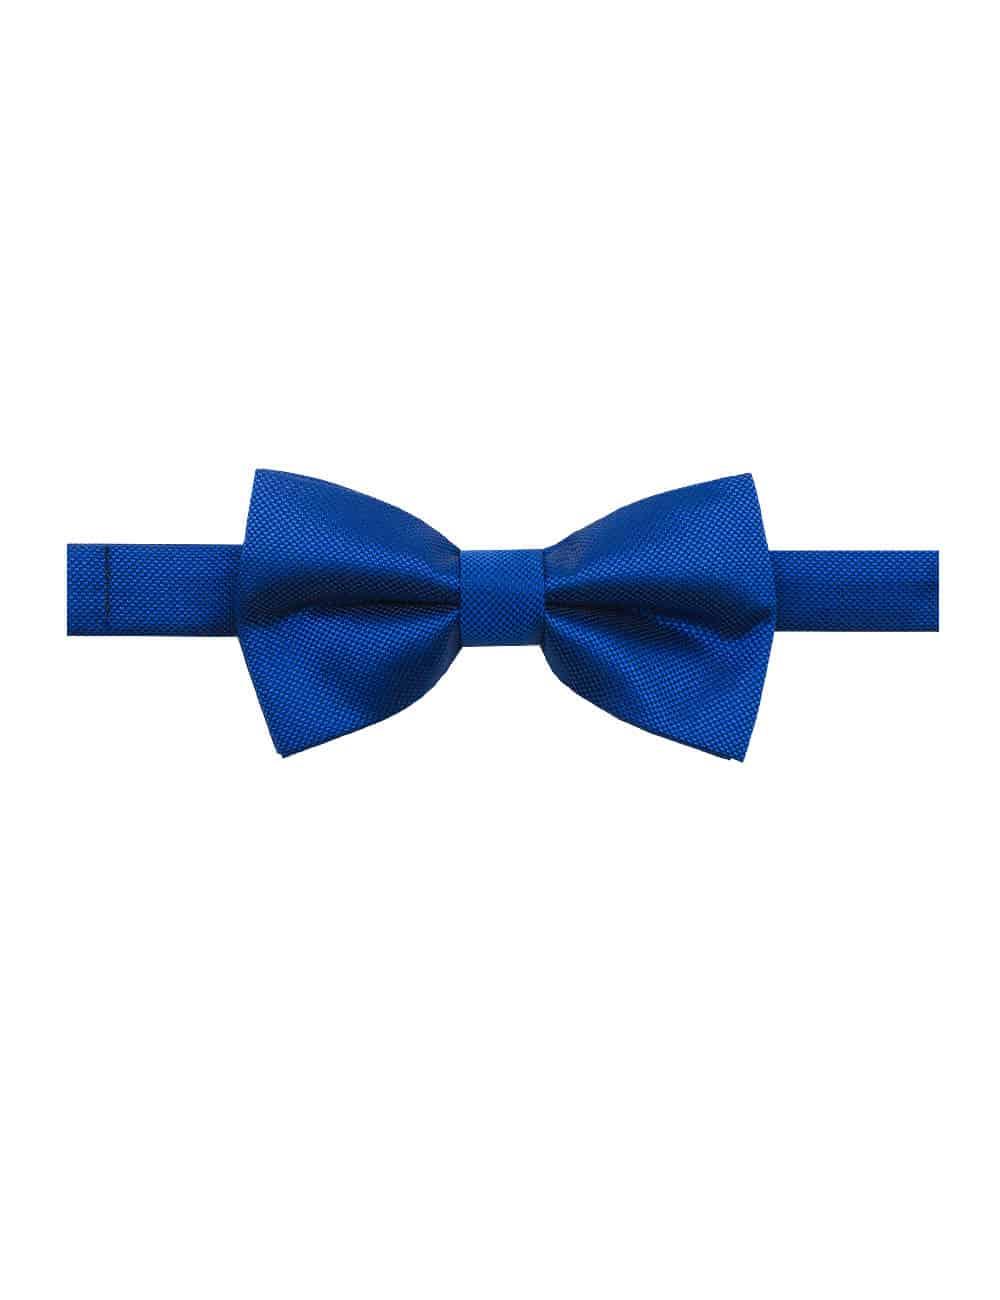 Blue Dobby Woven Bowtie WBT17.7